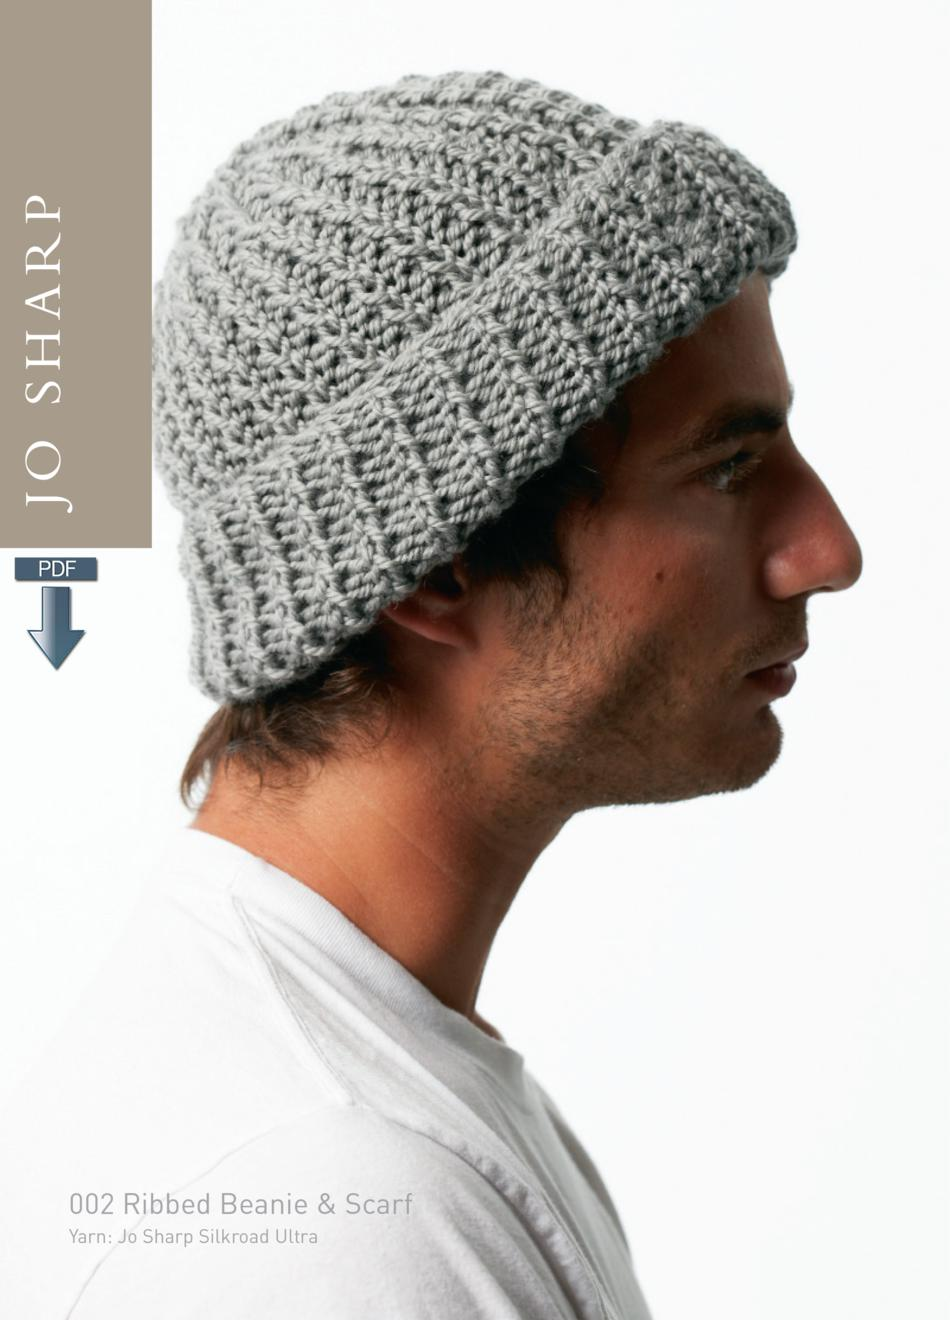 Knitting Pattern Ribbed Beanie : Jo Sharp Ribbed Beanie and Scarf Pattern - Pattern Download, Knitting Pattern...